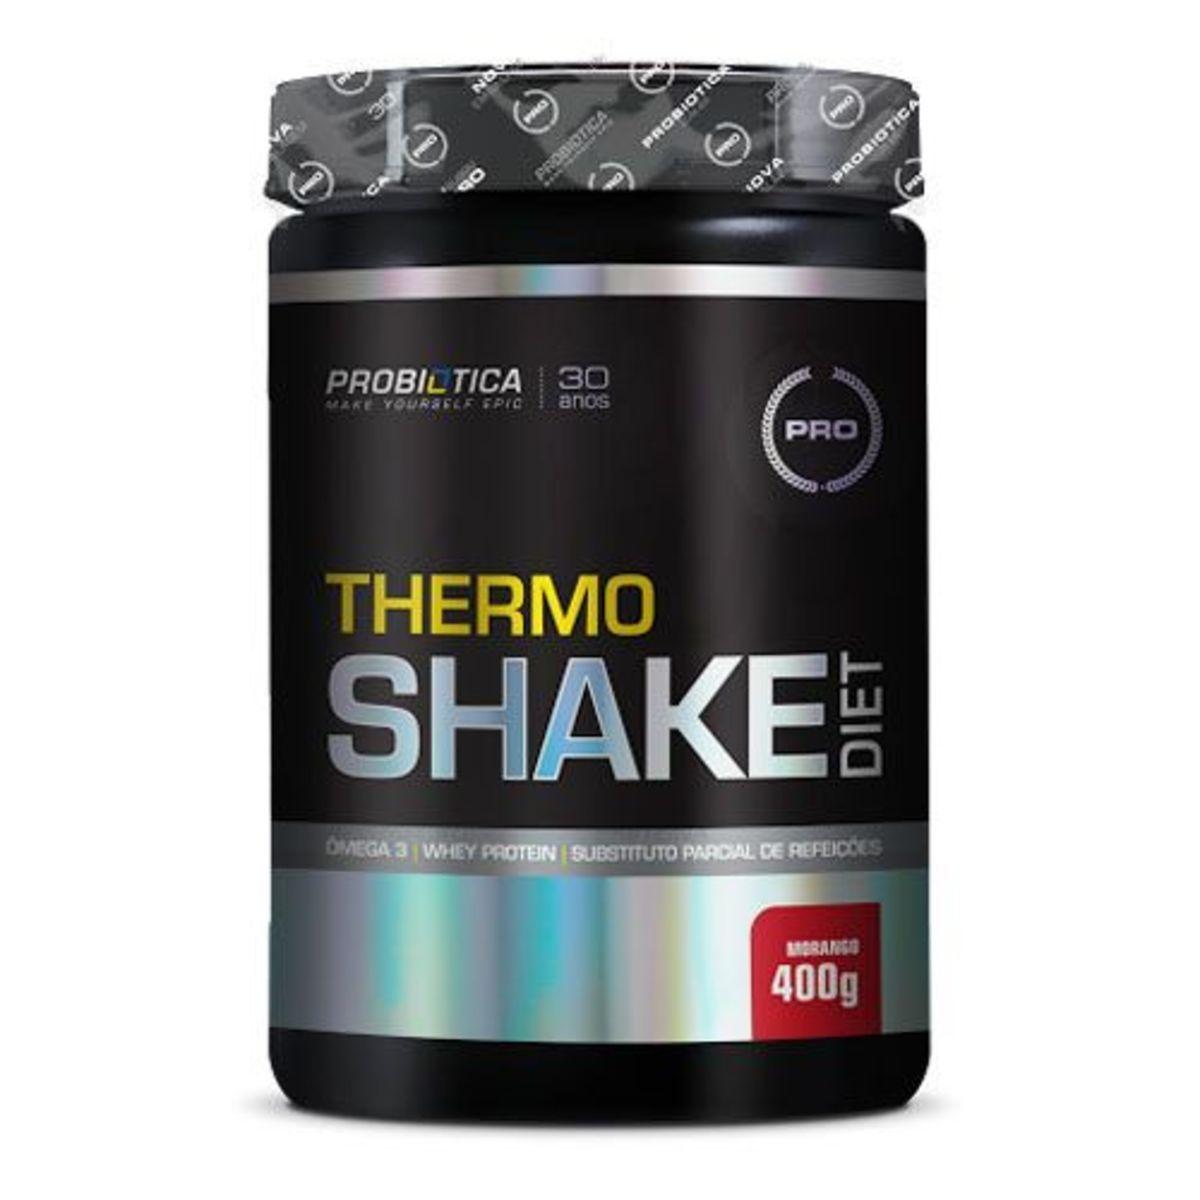 THERMOSHAKE DIET MORANGO 400G - Probiotica